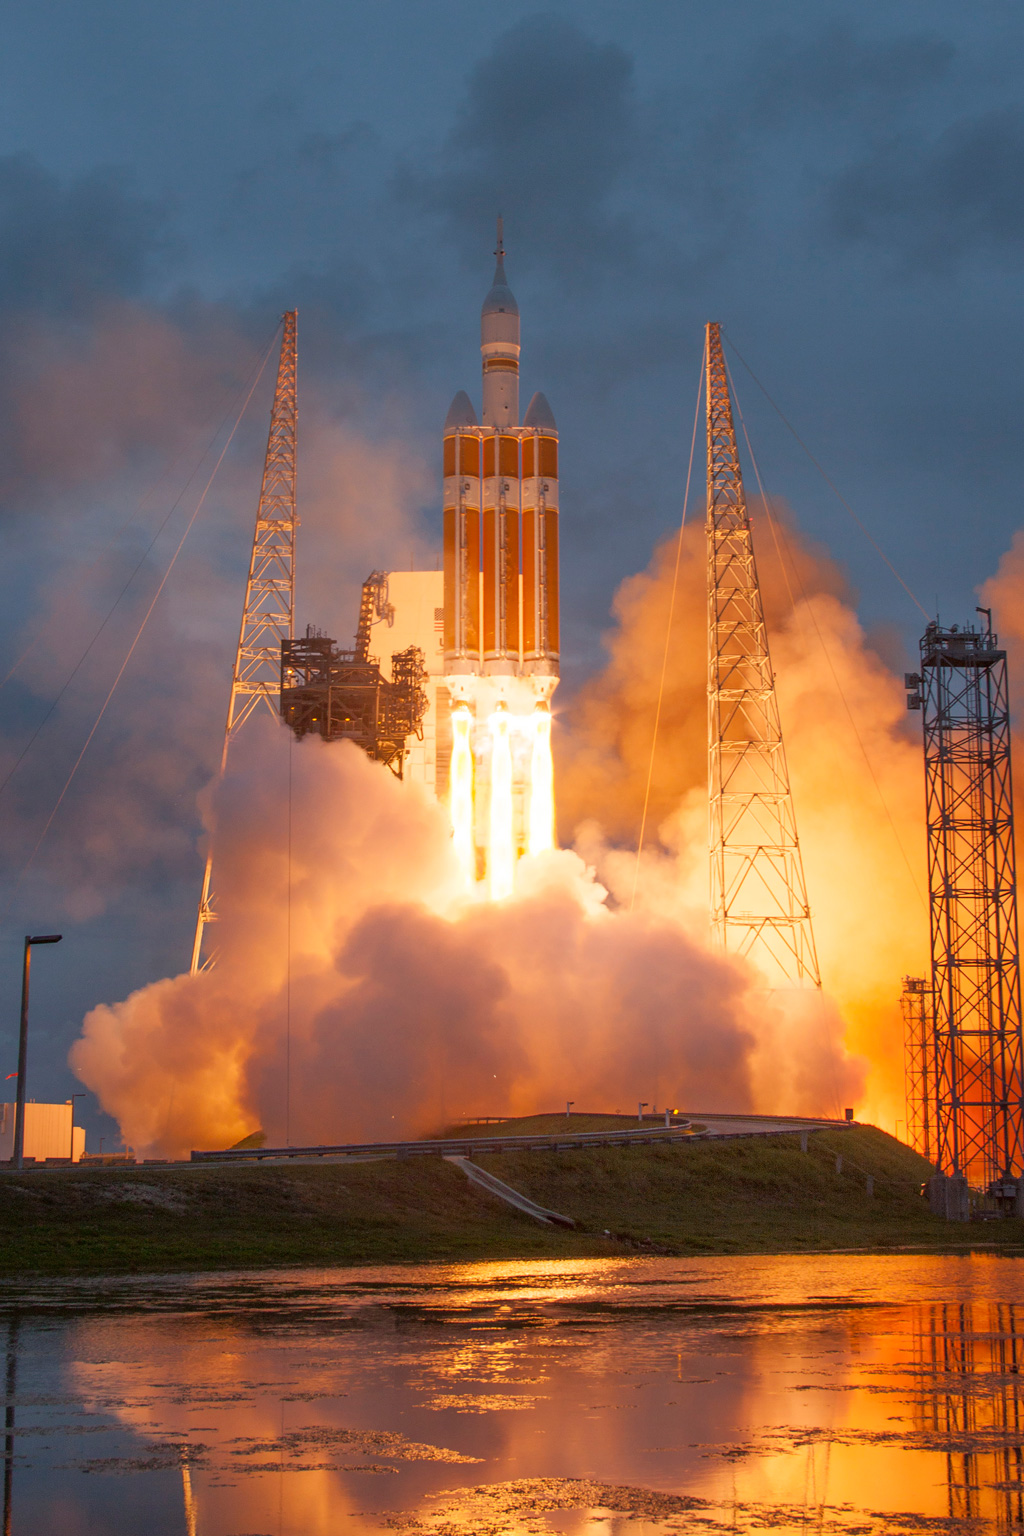 nasa orion launch hq high res photos (7)